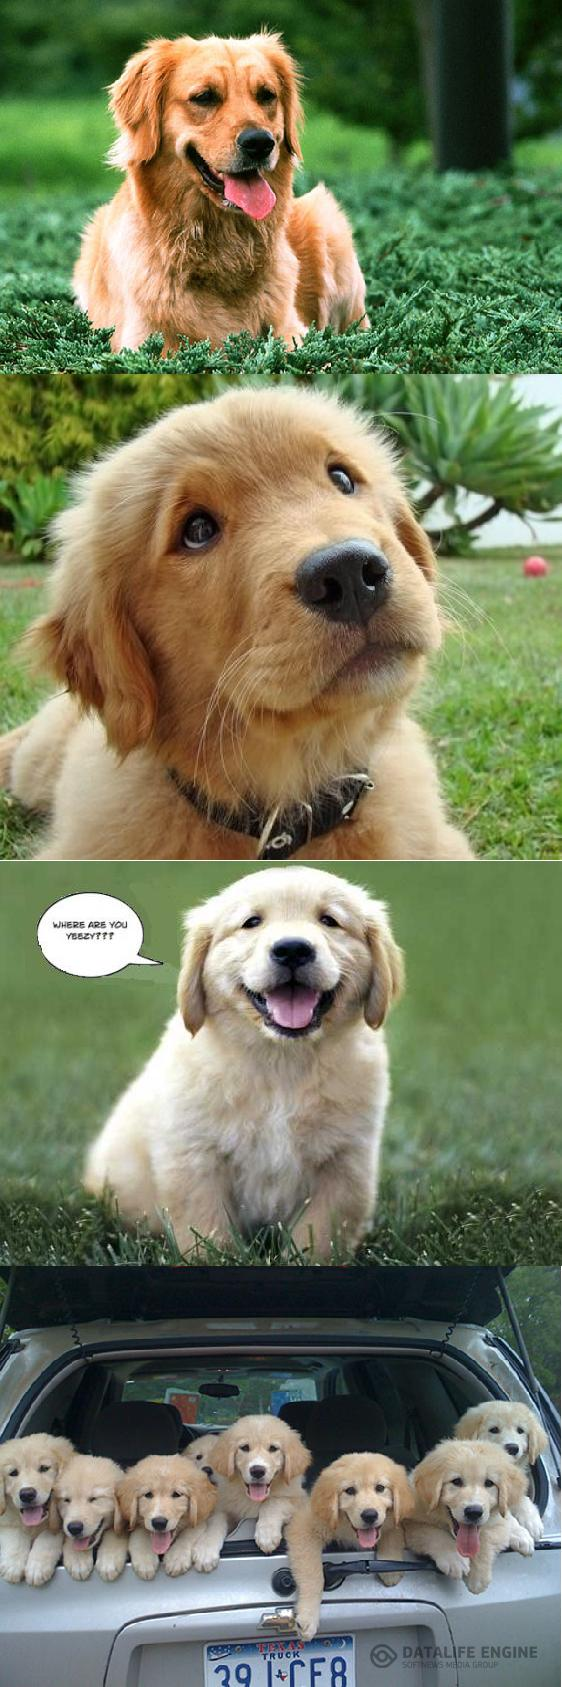 Golden retriever puppies 7 PHOTO! Hunde